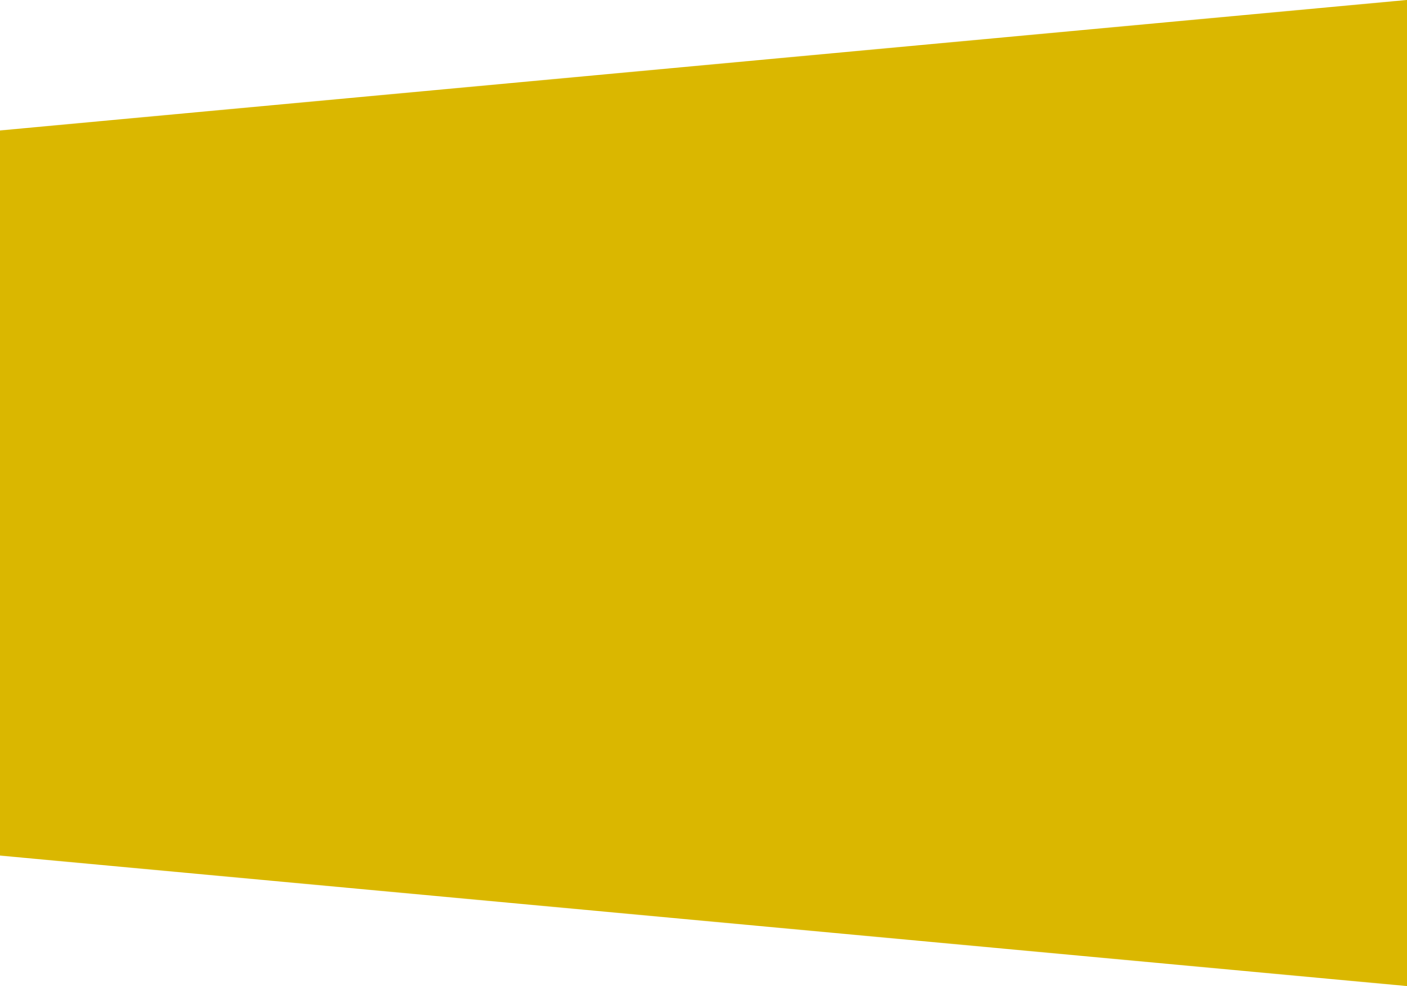 tekstvlak_grijs-bruin.png (copy)